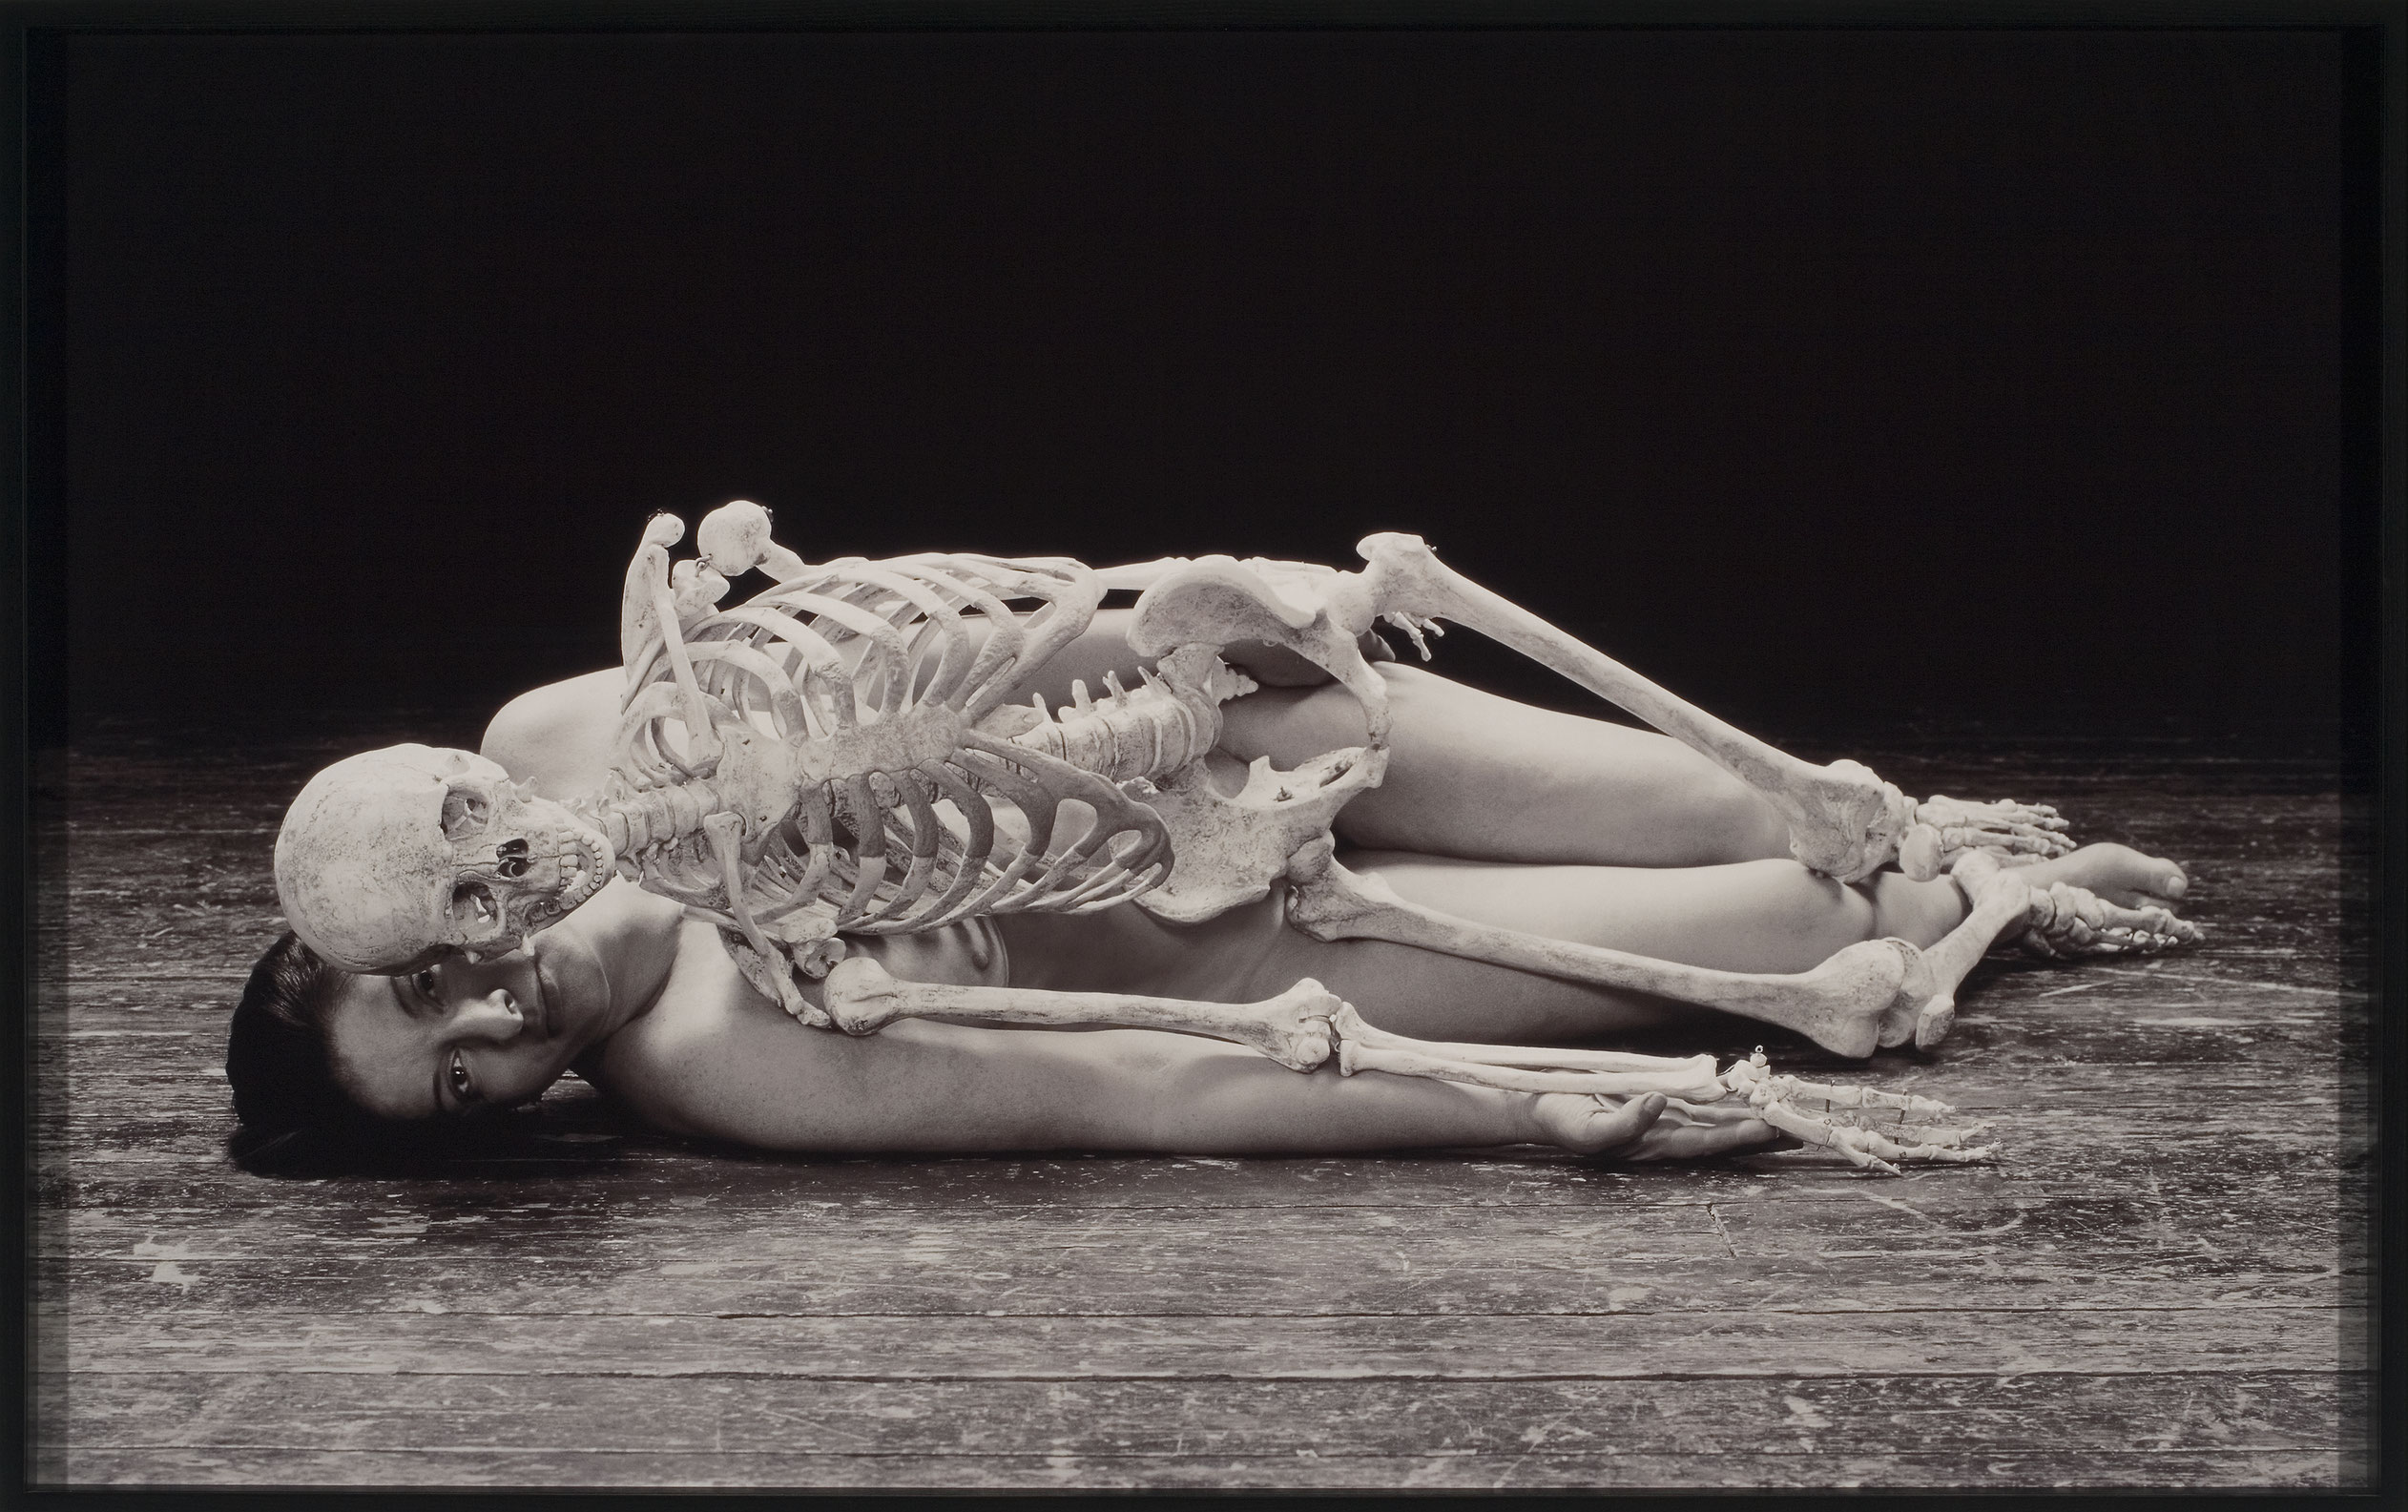 Self Portrait with Skeleton, 2003, Marina Abramovic, Épreuve Cibachrome, 4/5.